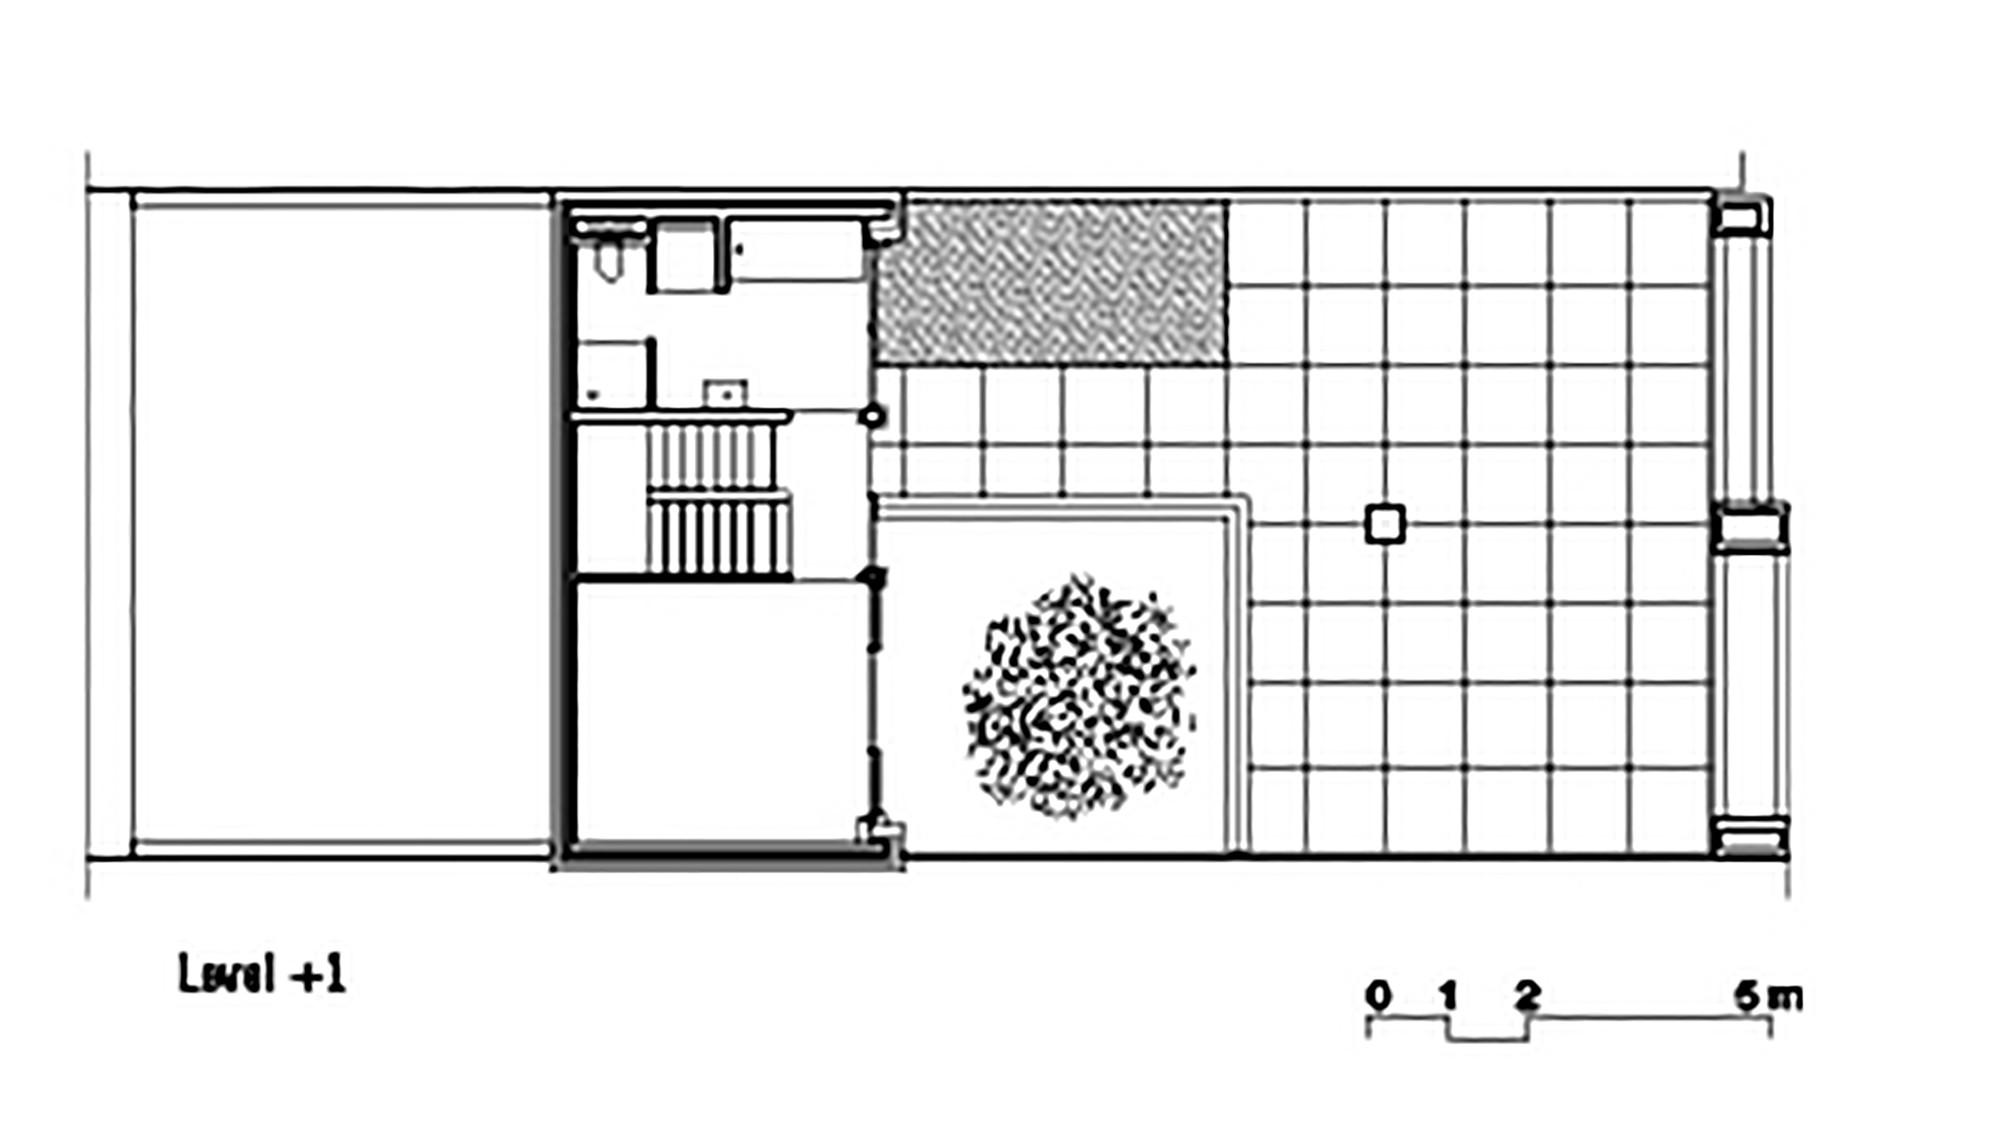 Gallery of House Plot 75 / Office Winhov - 10